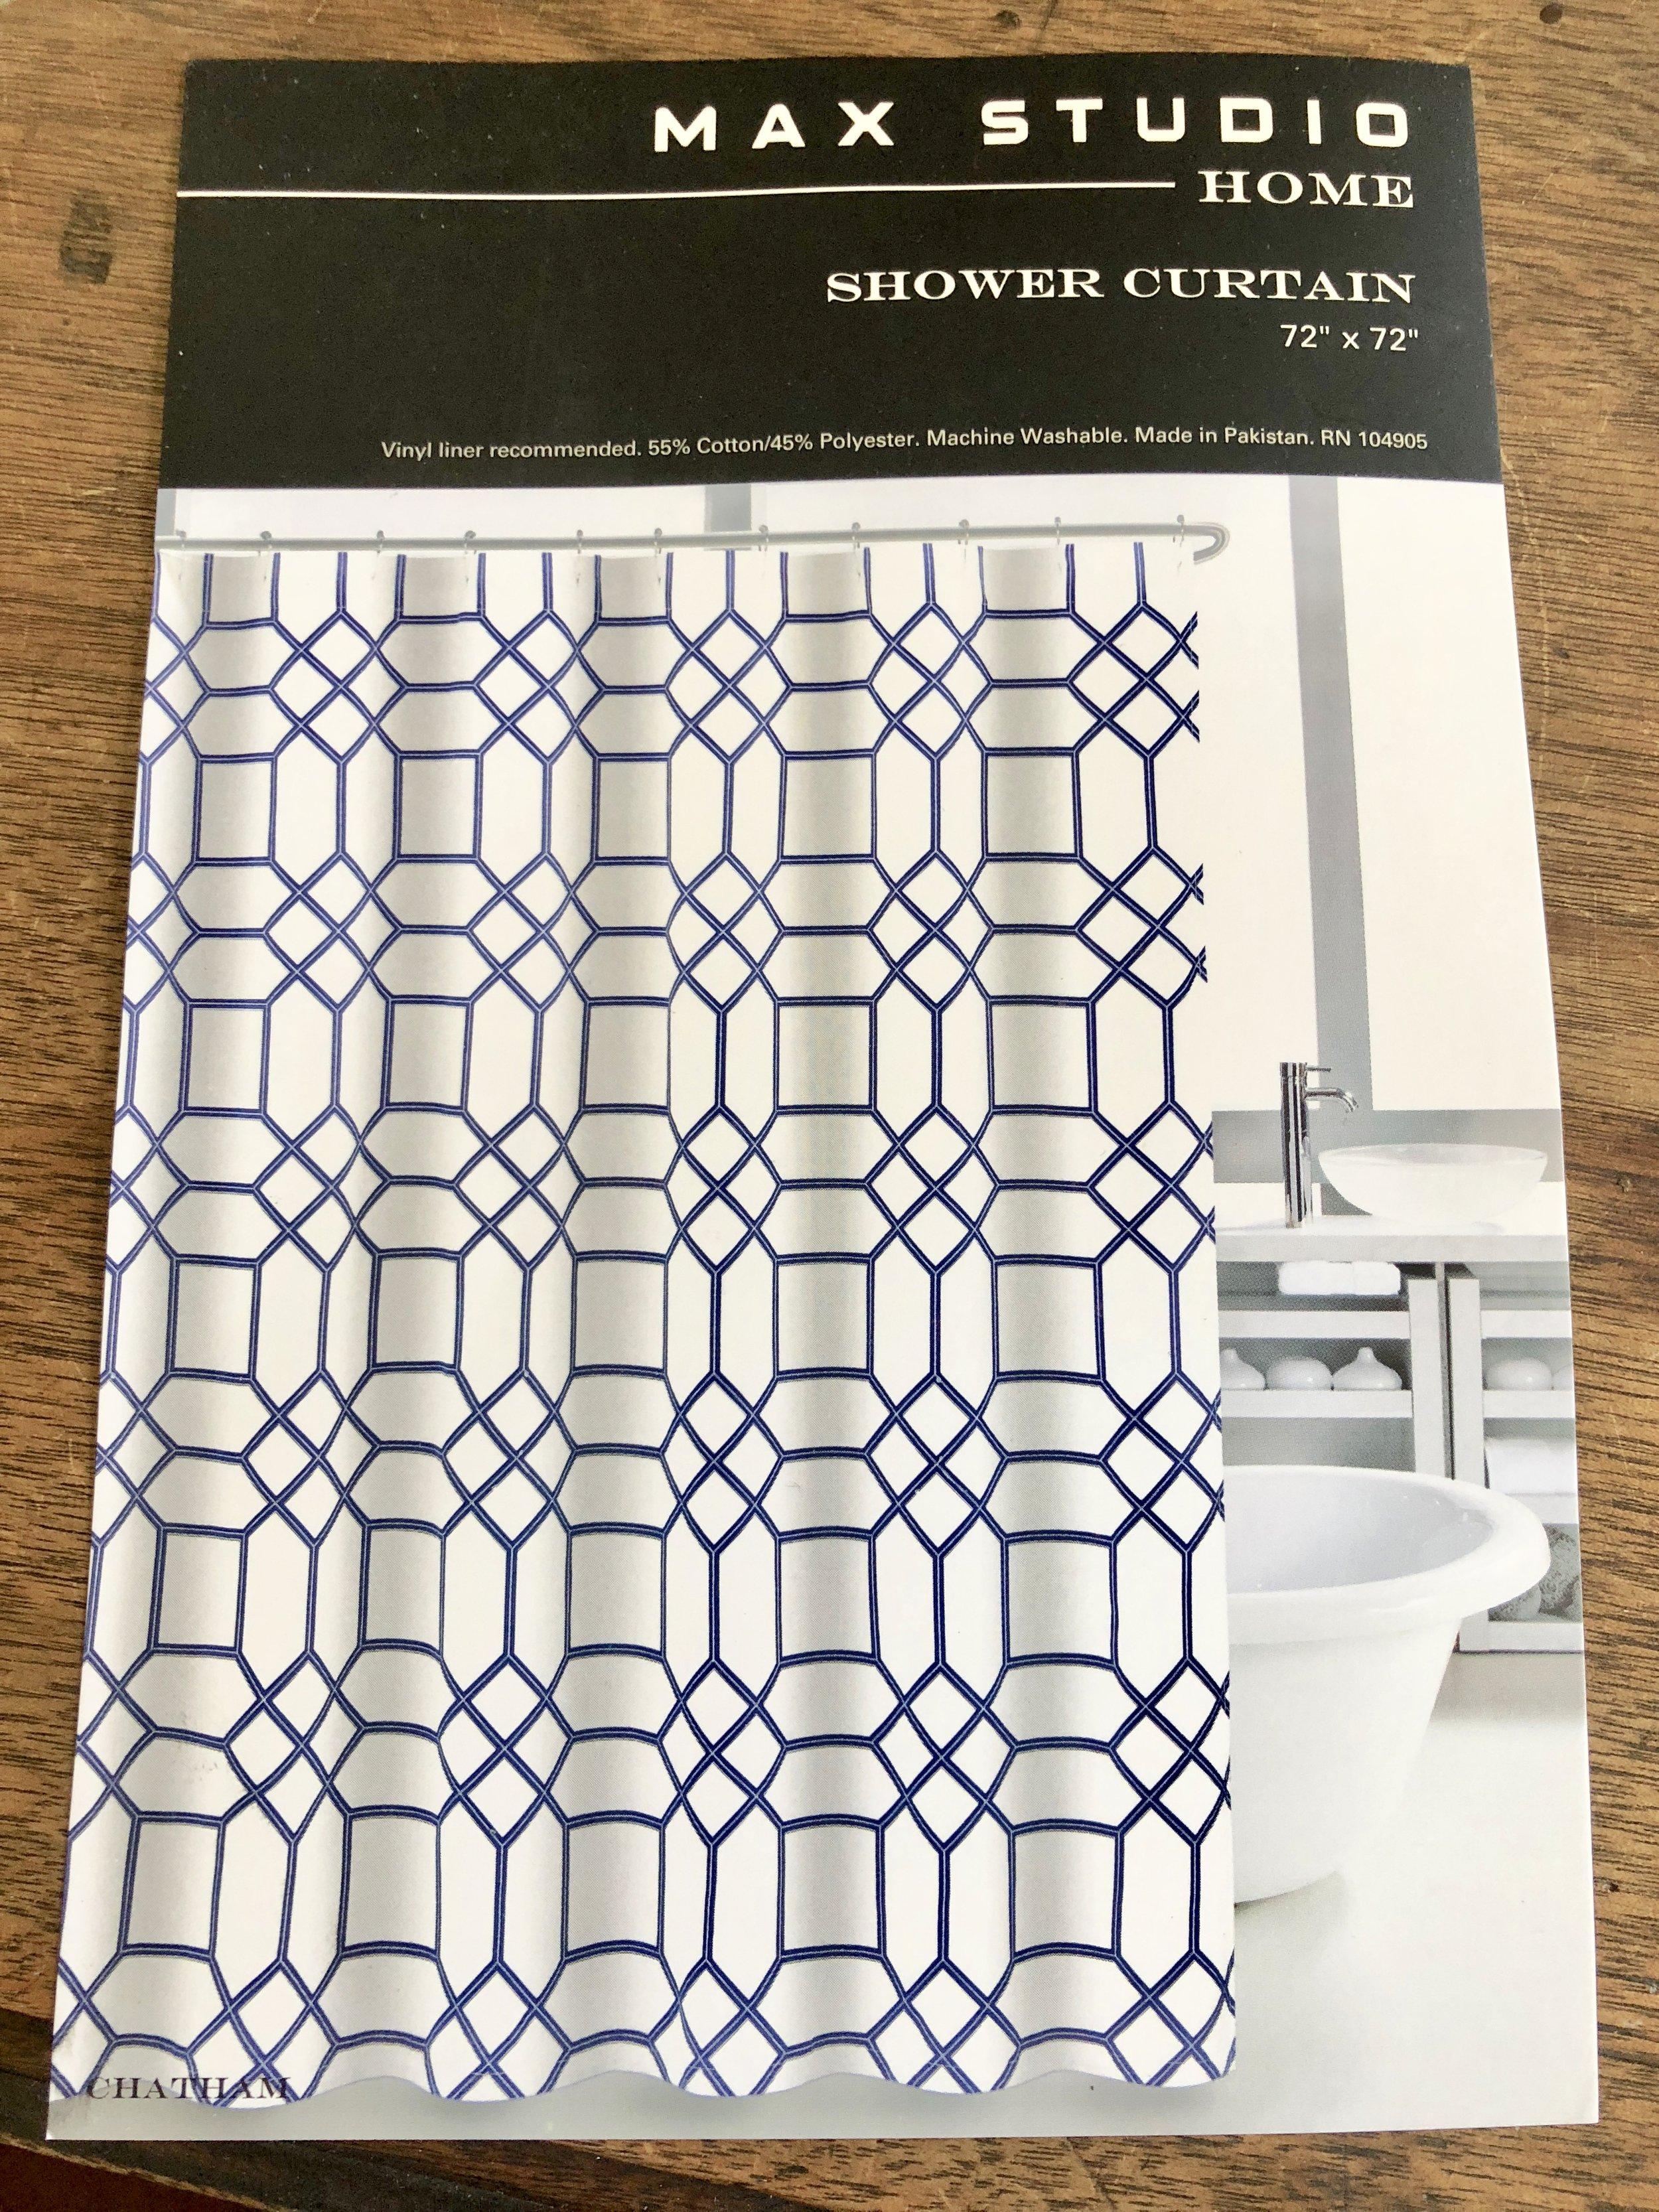 Max Studio Shower Curtain - Chatham